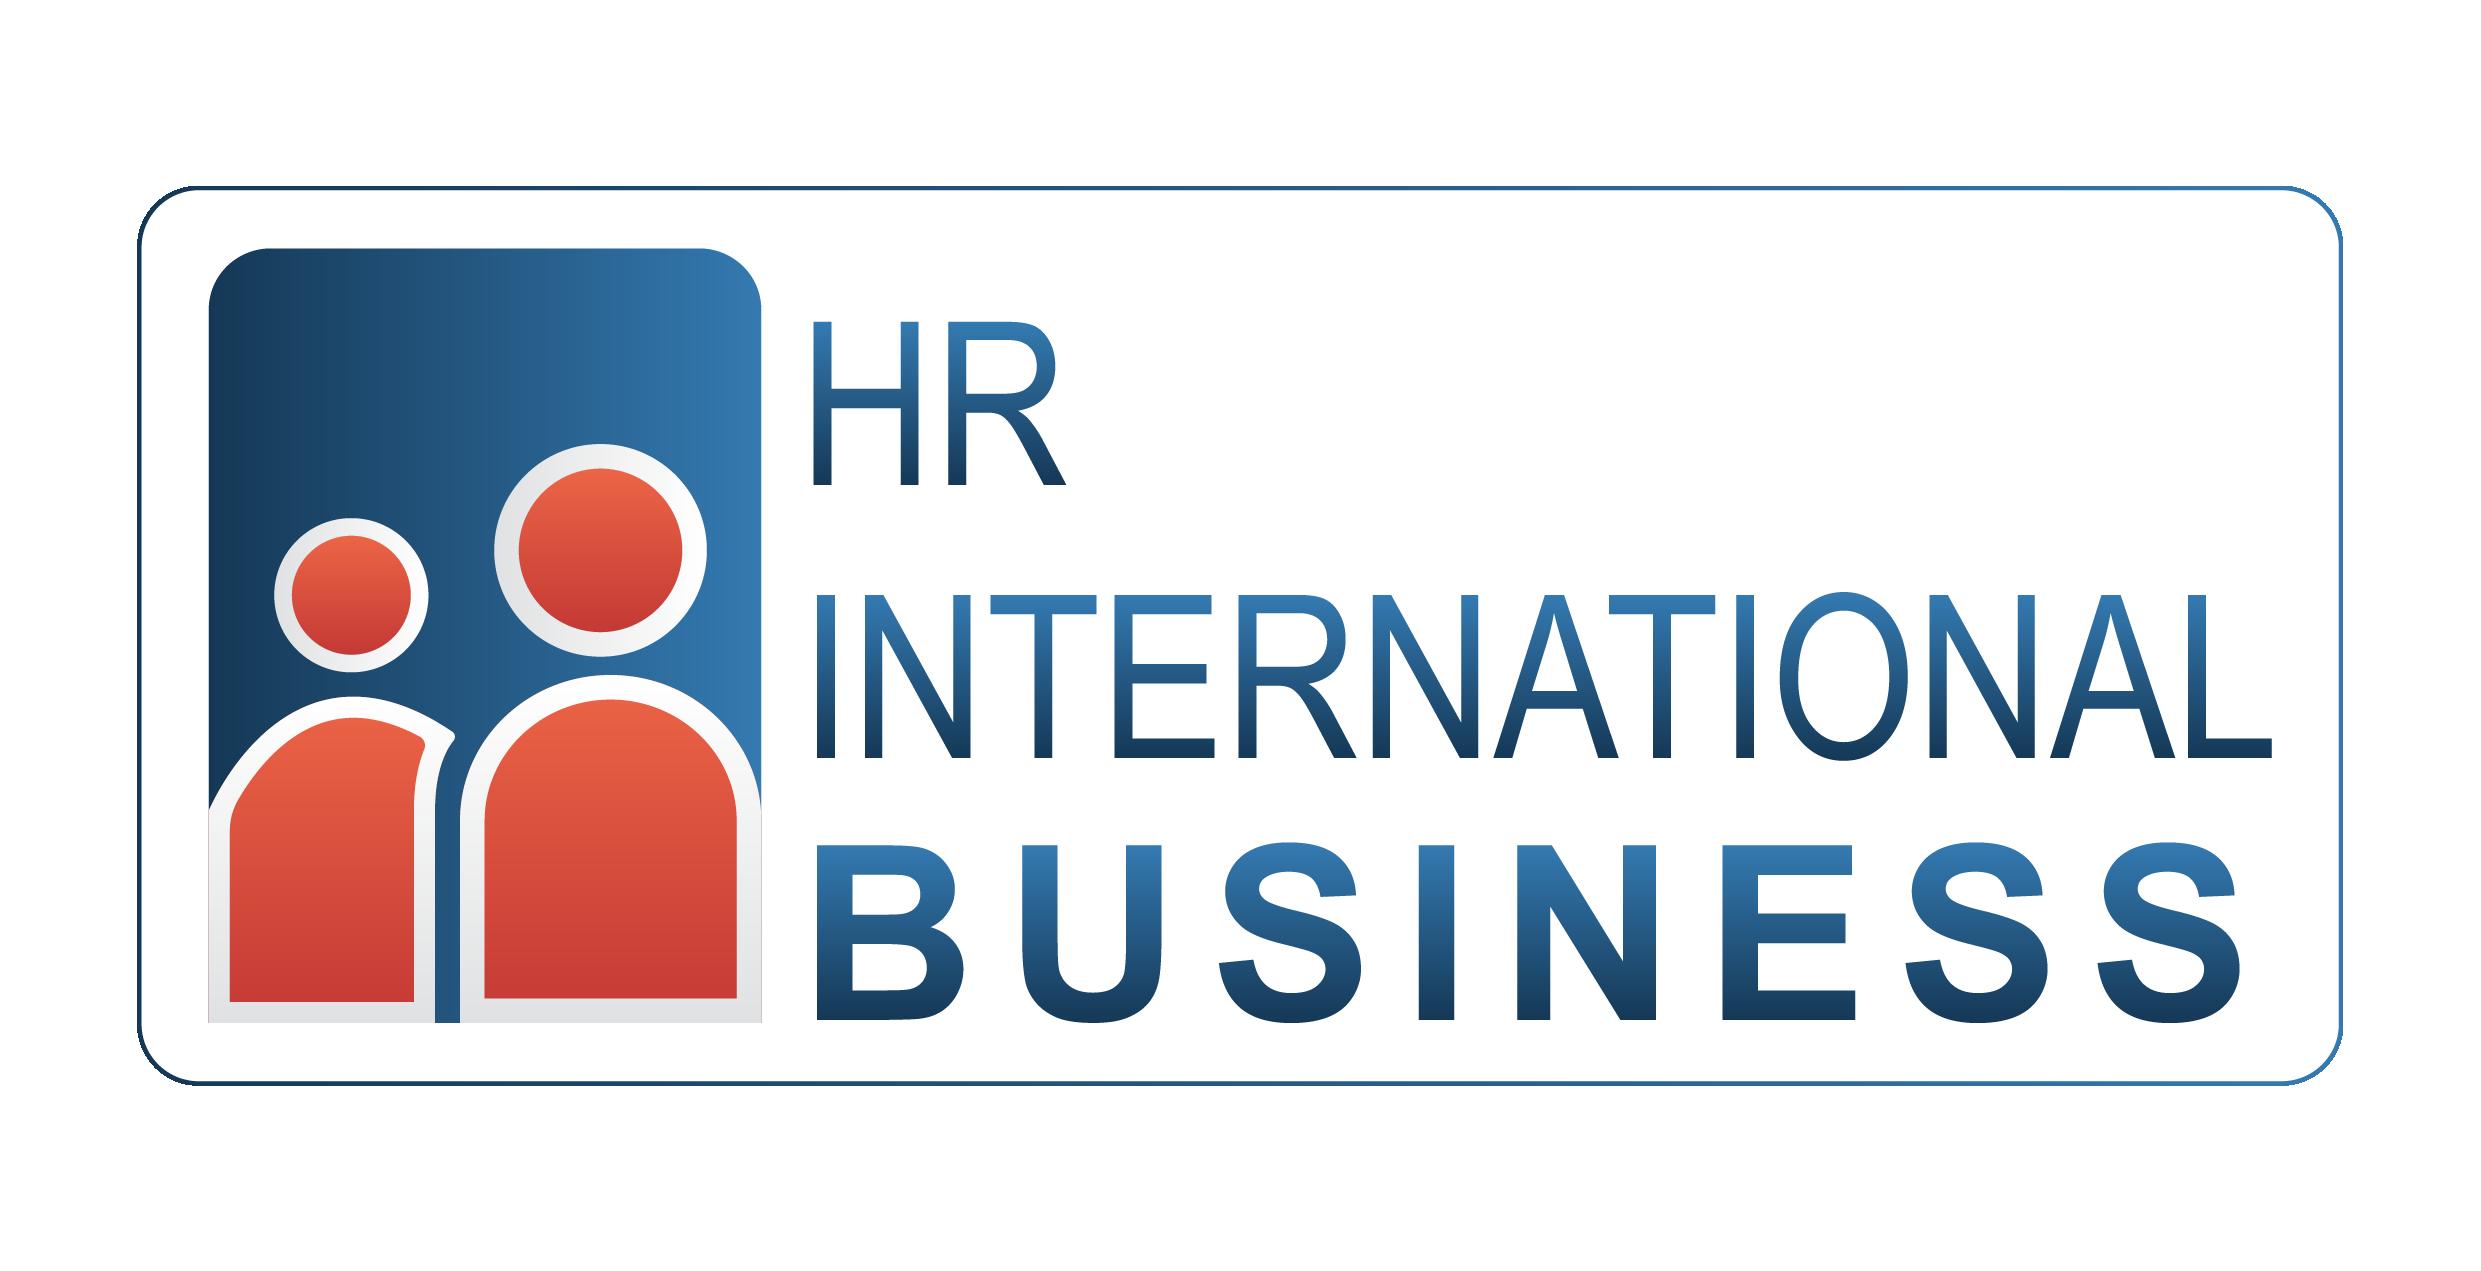 HRIB | HR International Business